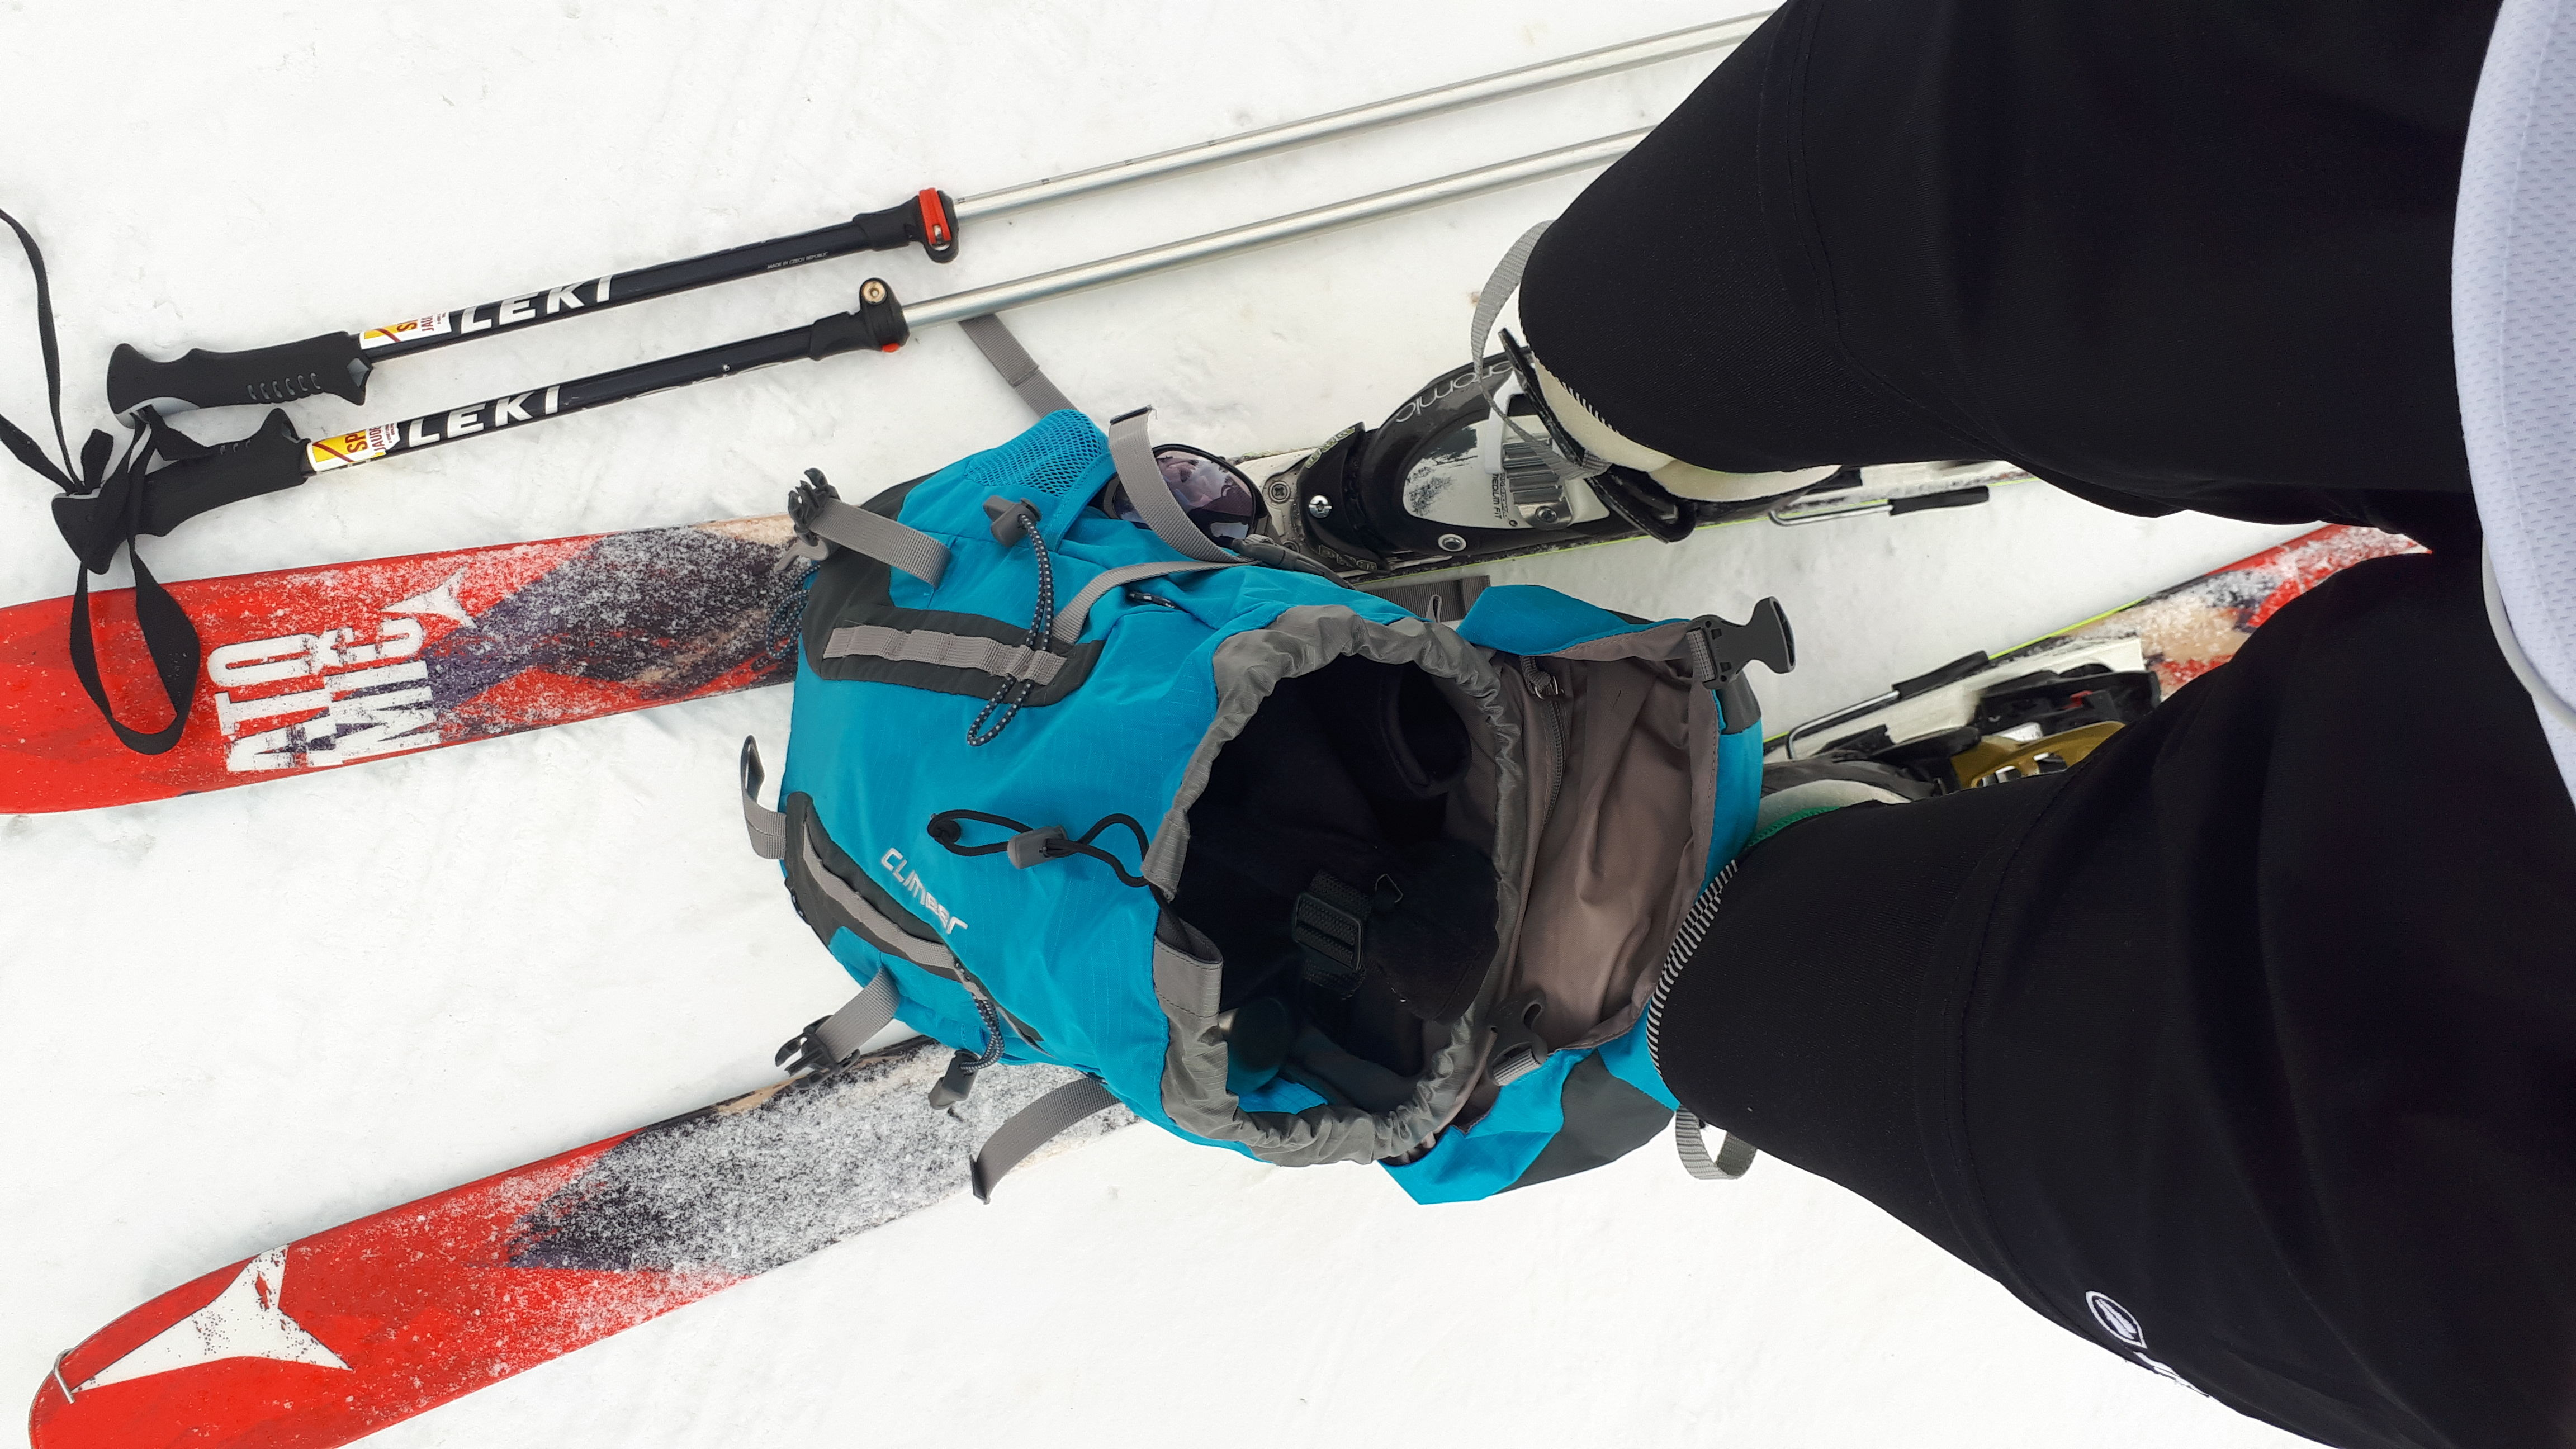 Voll im Trend: Skitouren